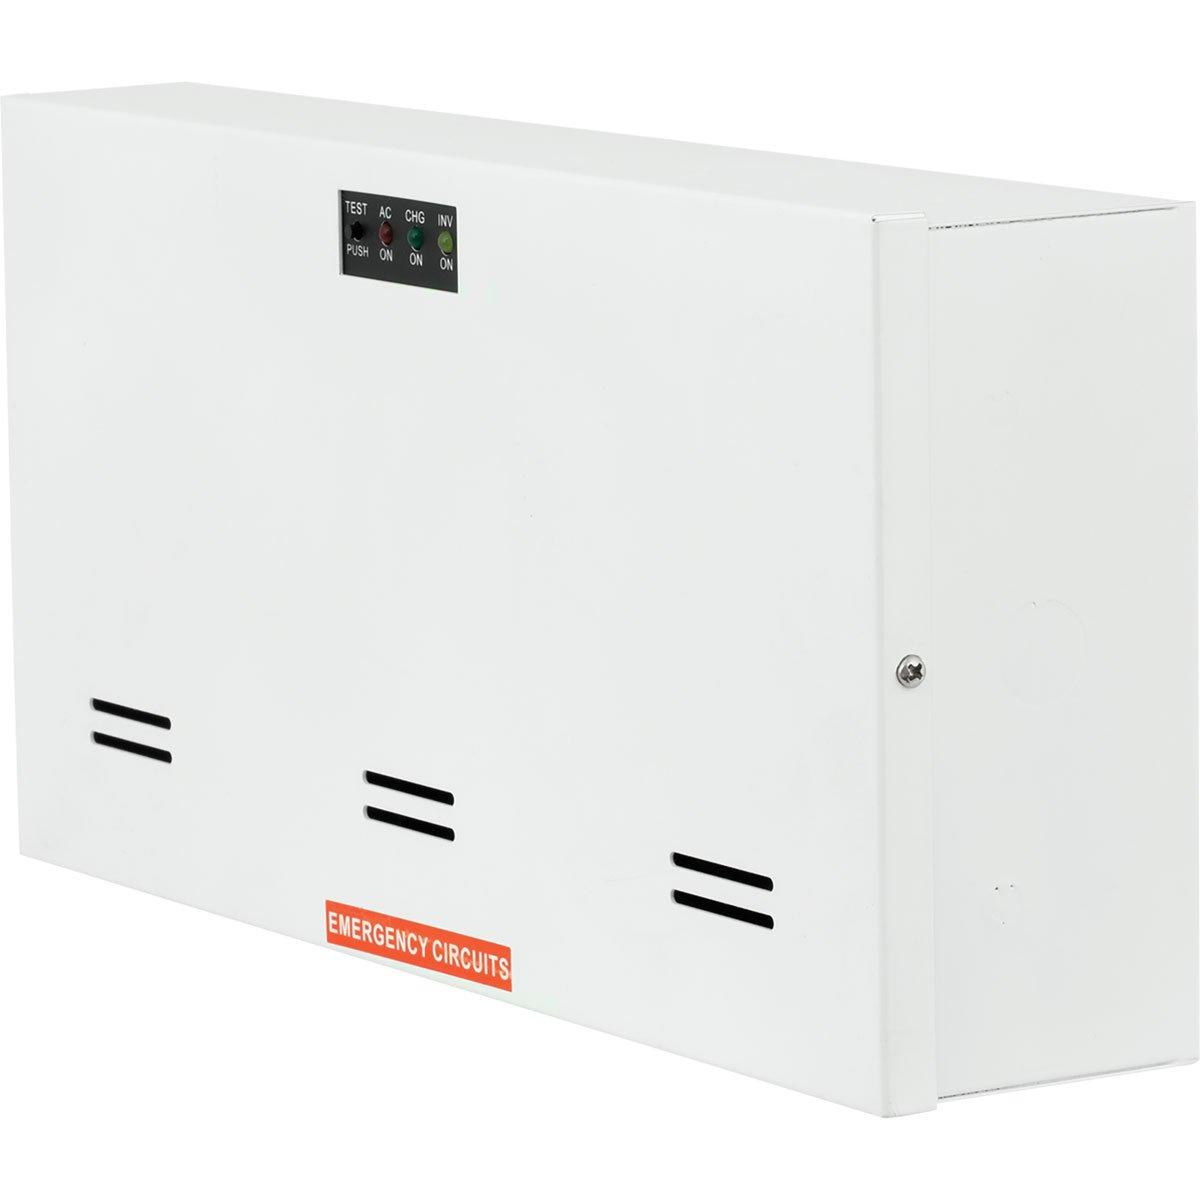 Progress Commercial PECLB-55-30-S Micro Inverter, White